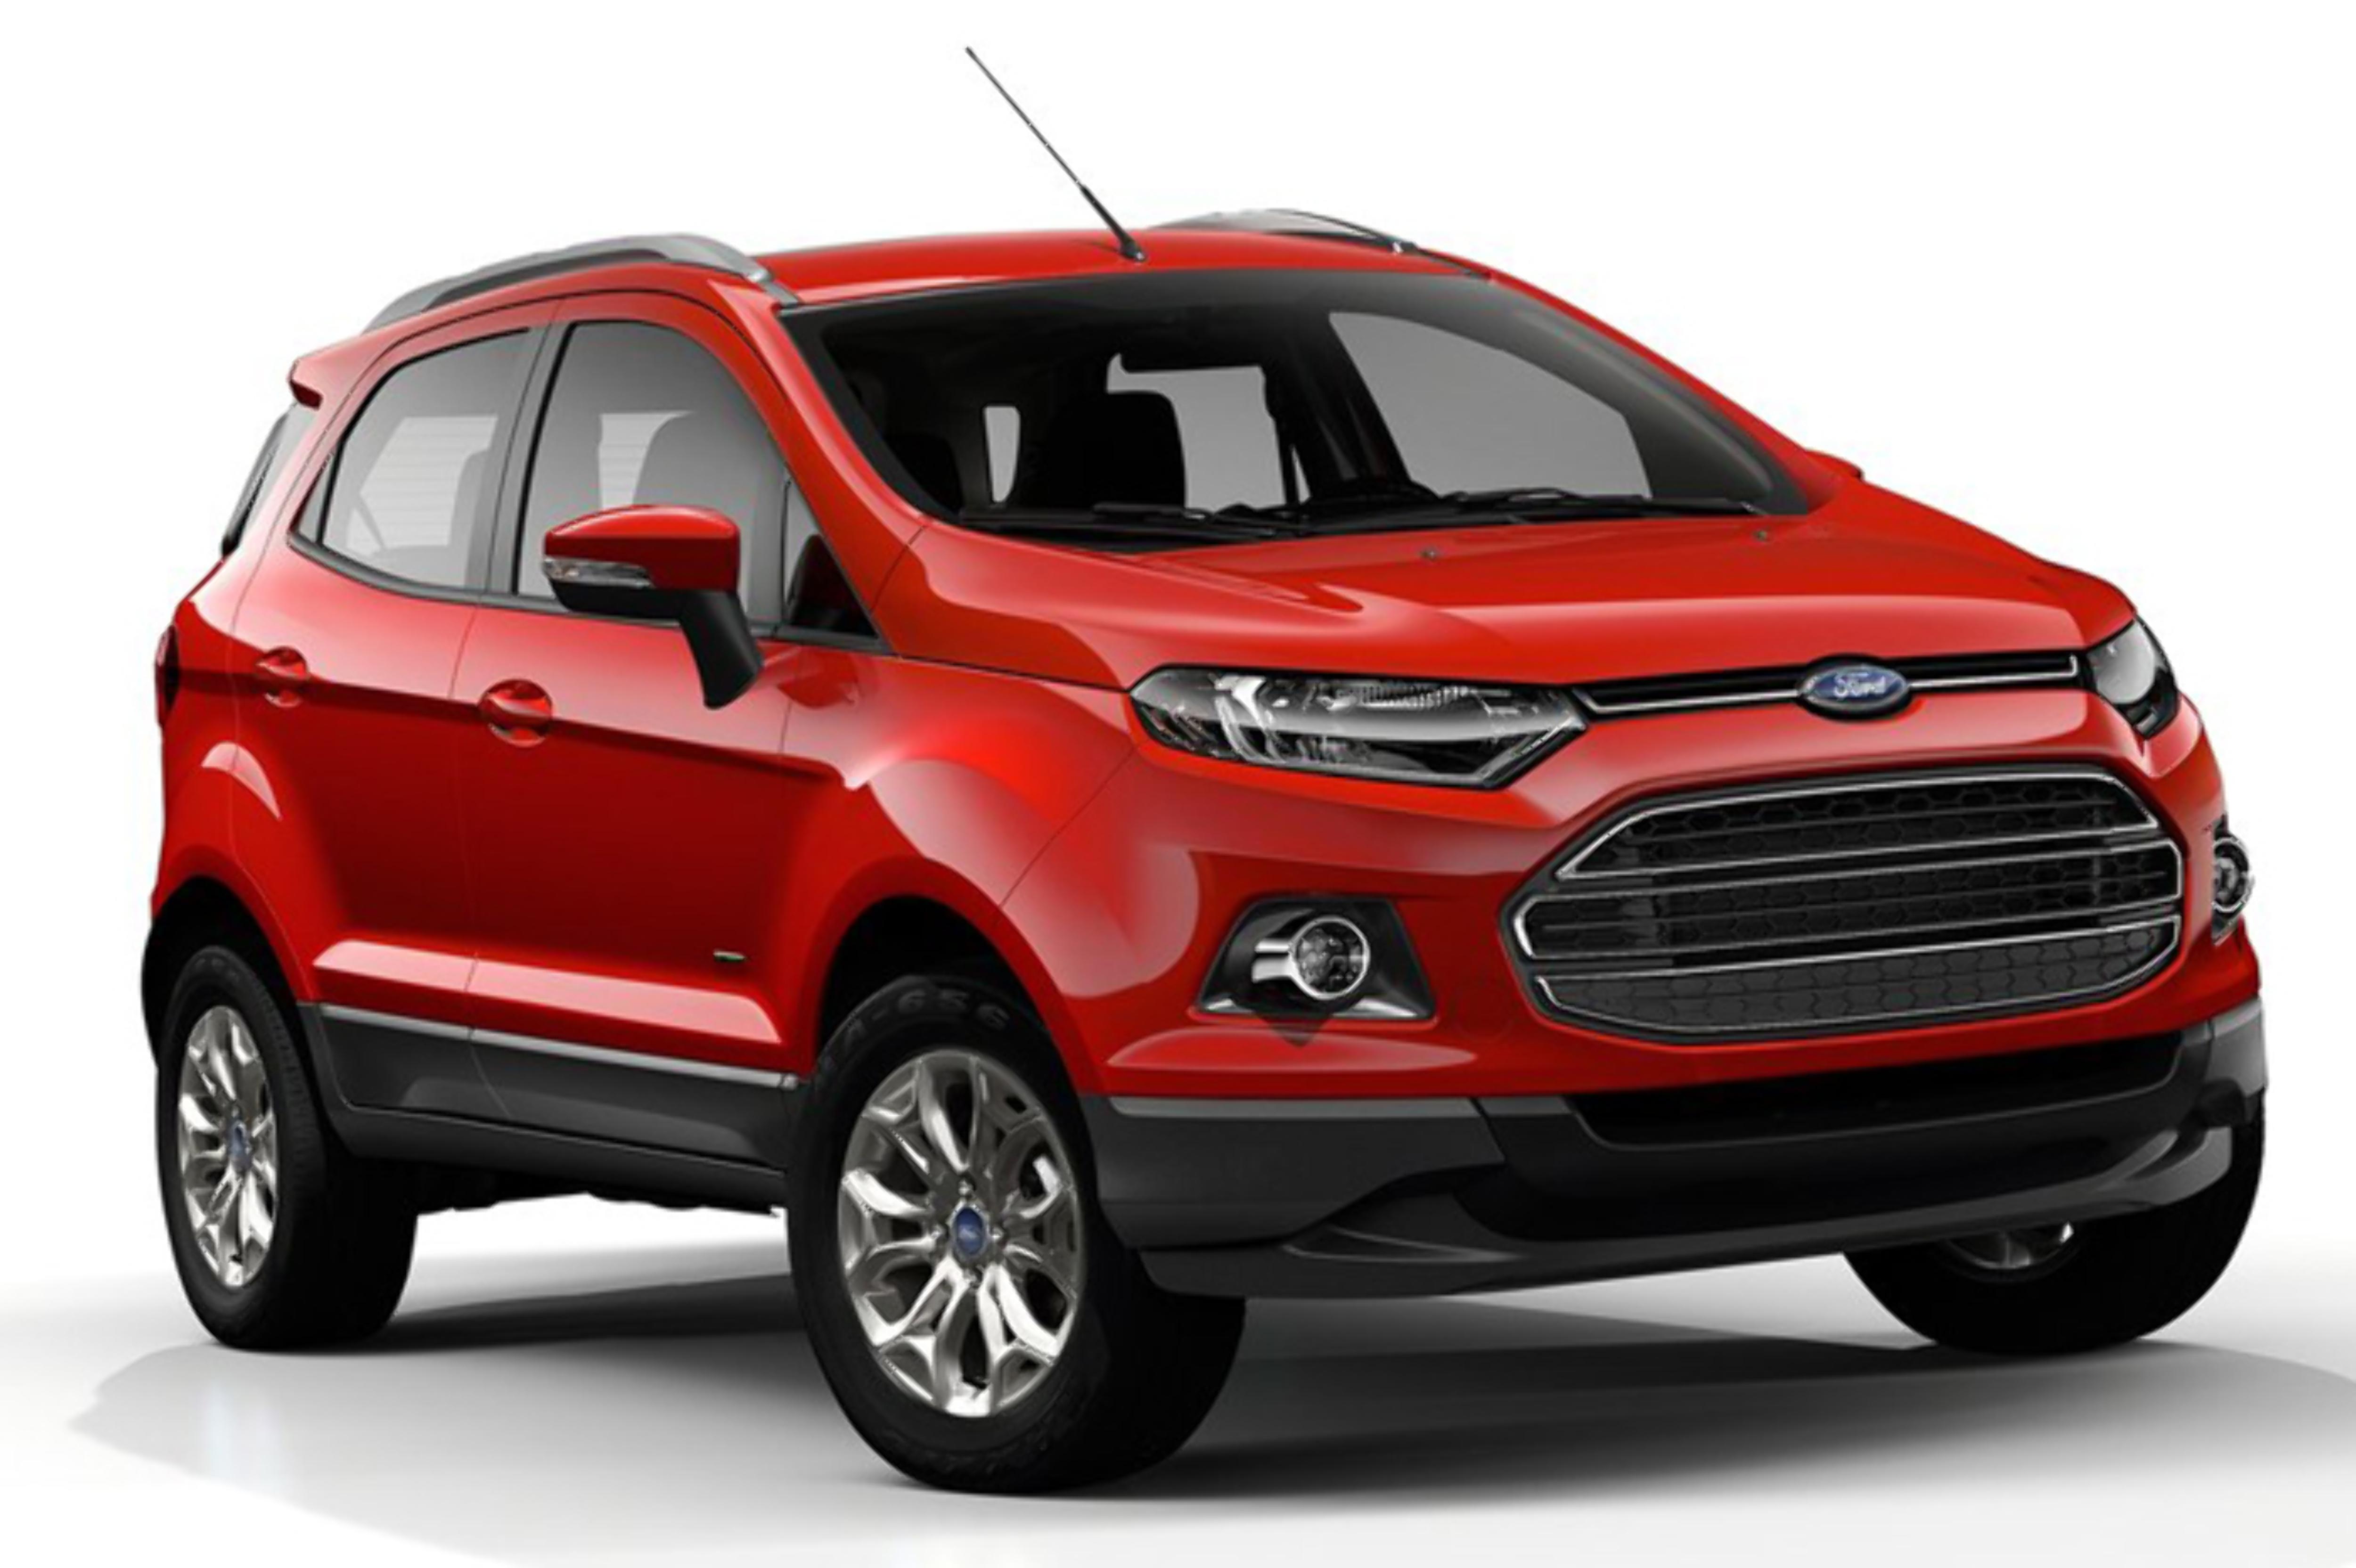 //datastore.rediff.com/h5000-w5000/thumb/  sc 1 st  Rediff Blogs & Ford Ecosport « Best Car Comparison India markmcfarlin.com